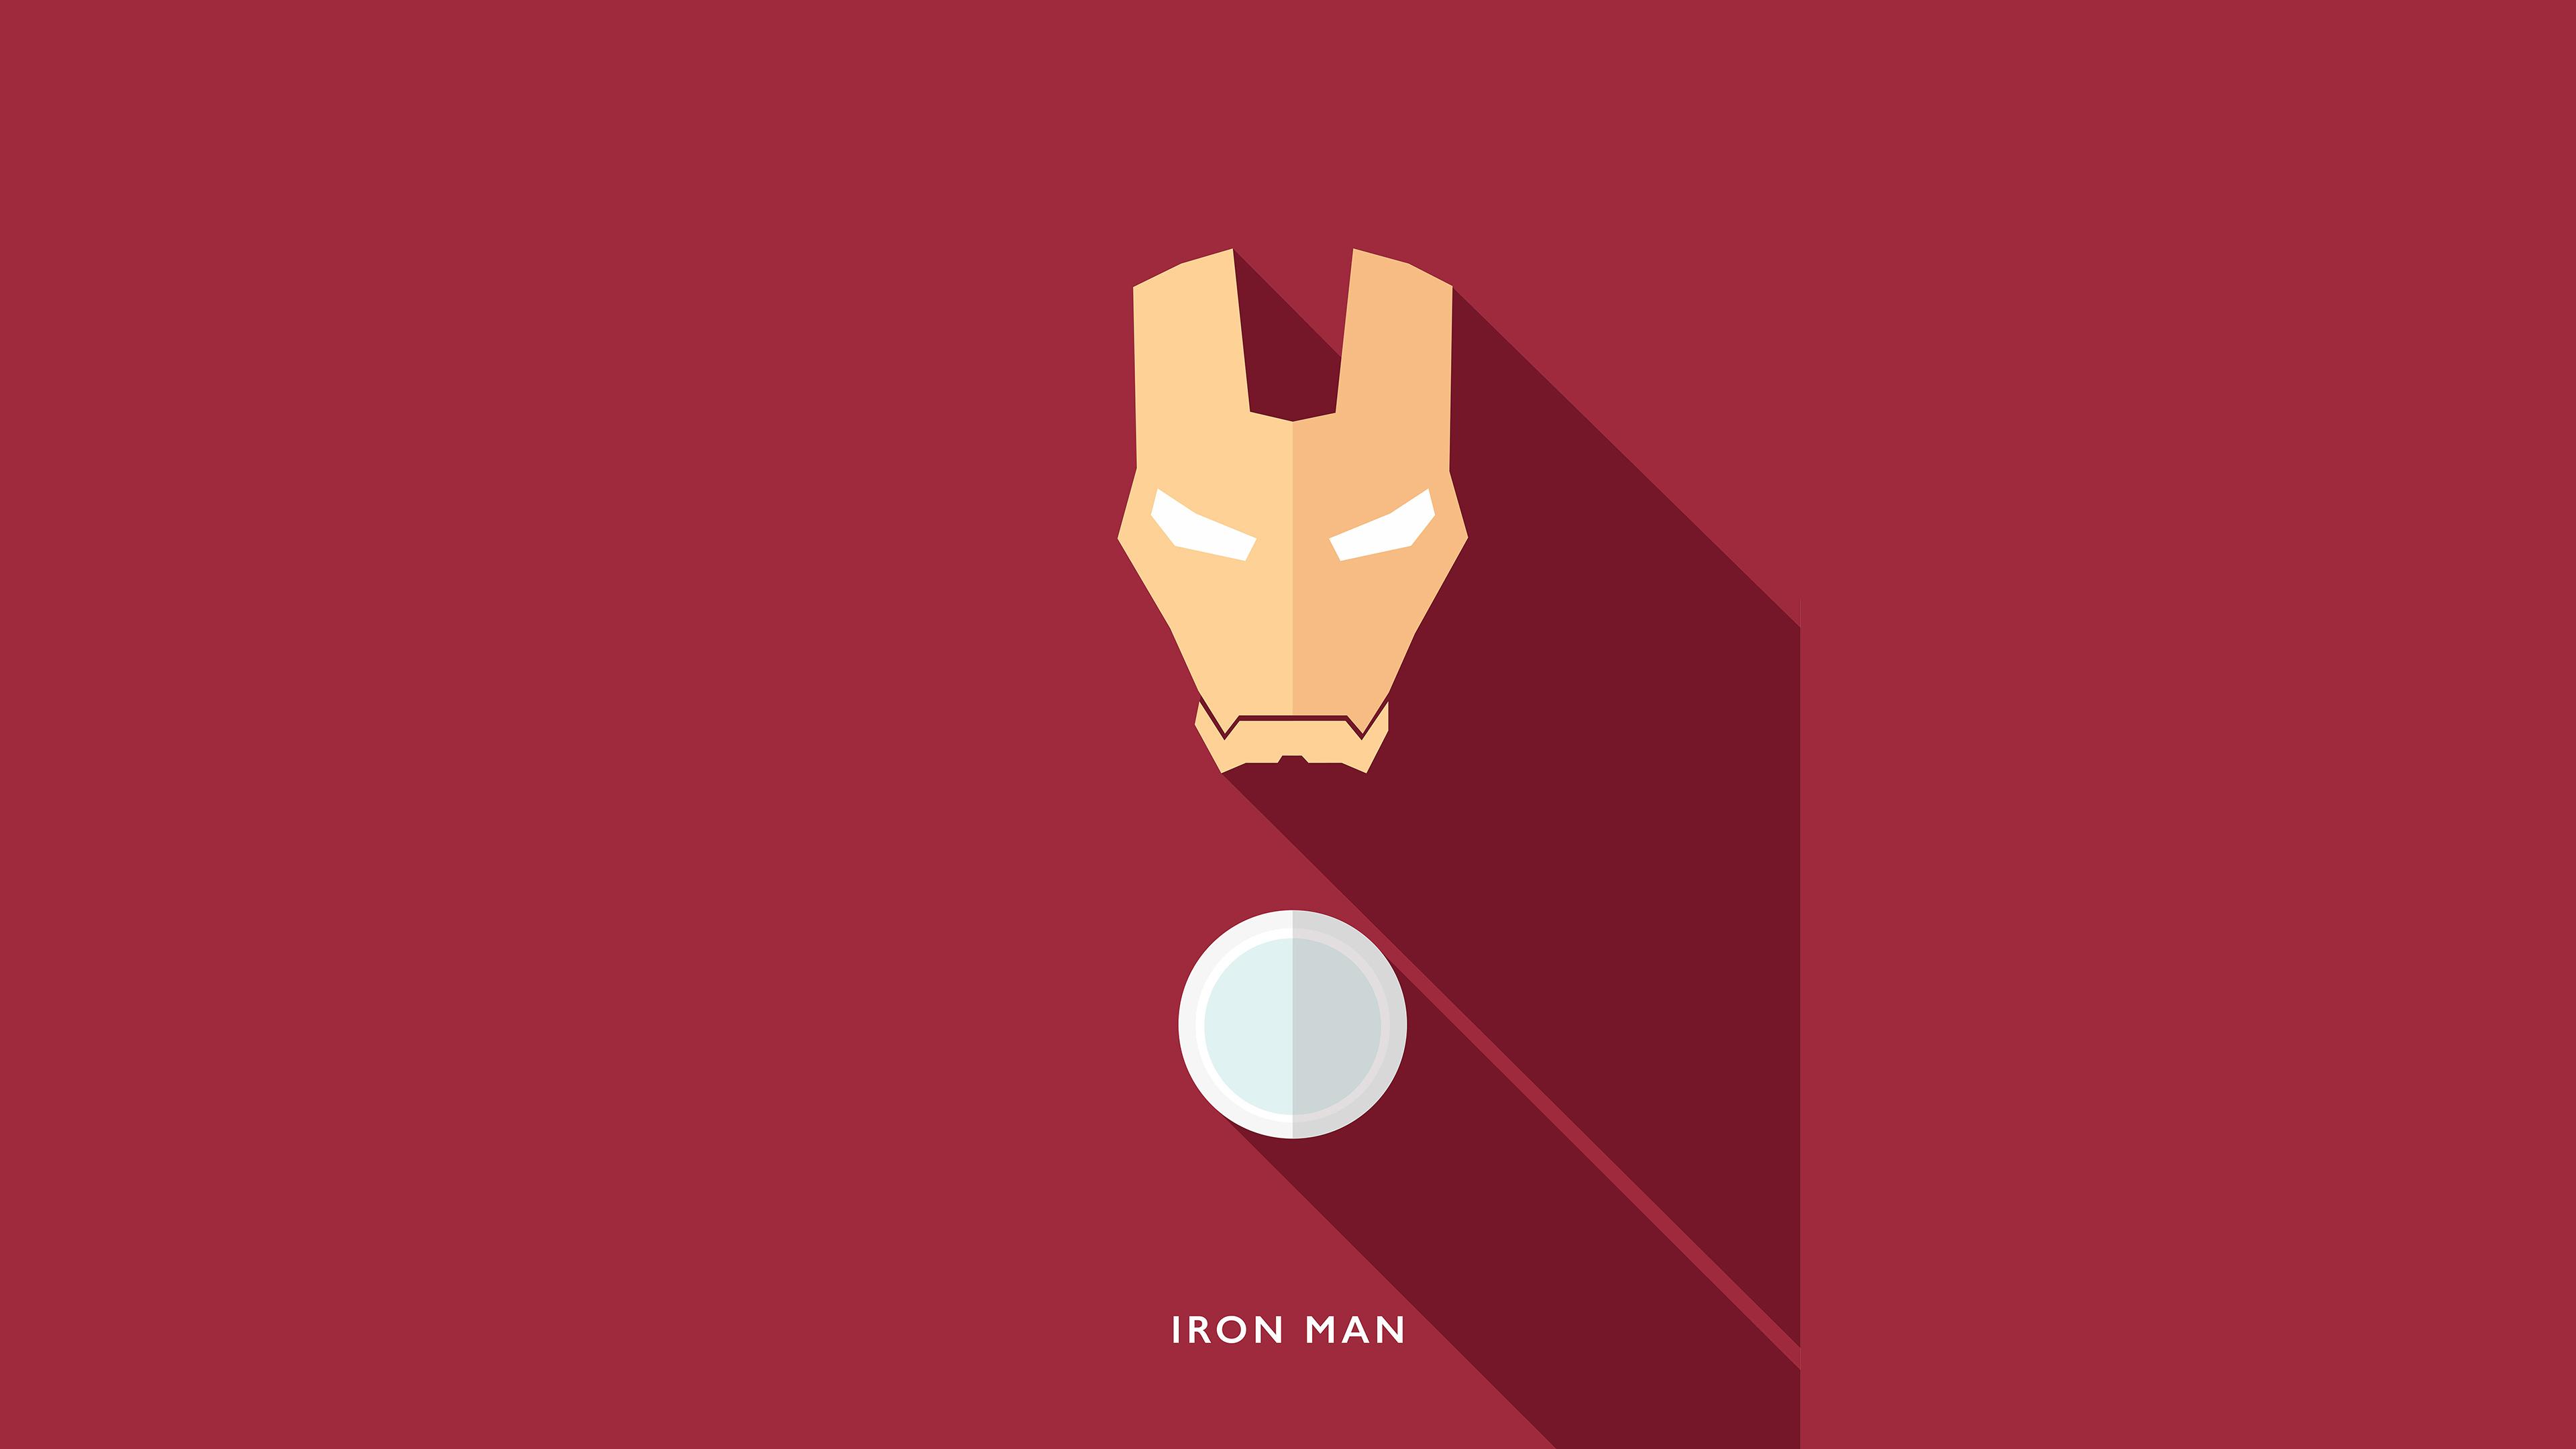 Free Download Iron Man 4k Ultra Hd Wallpaper Background